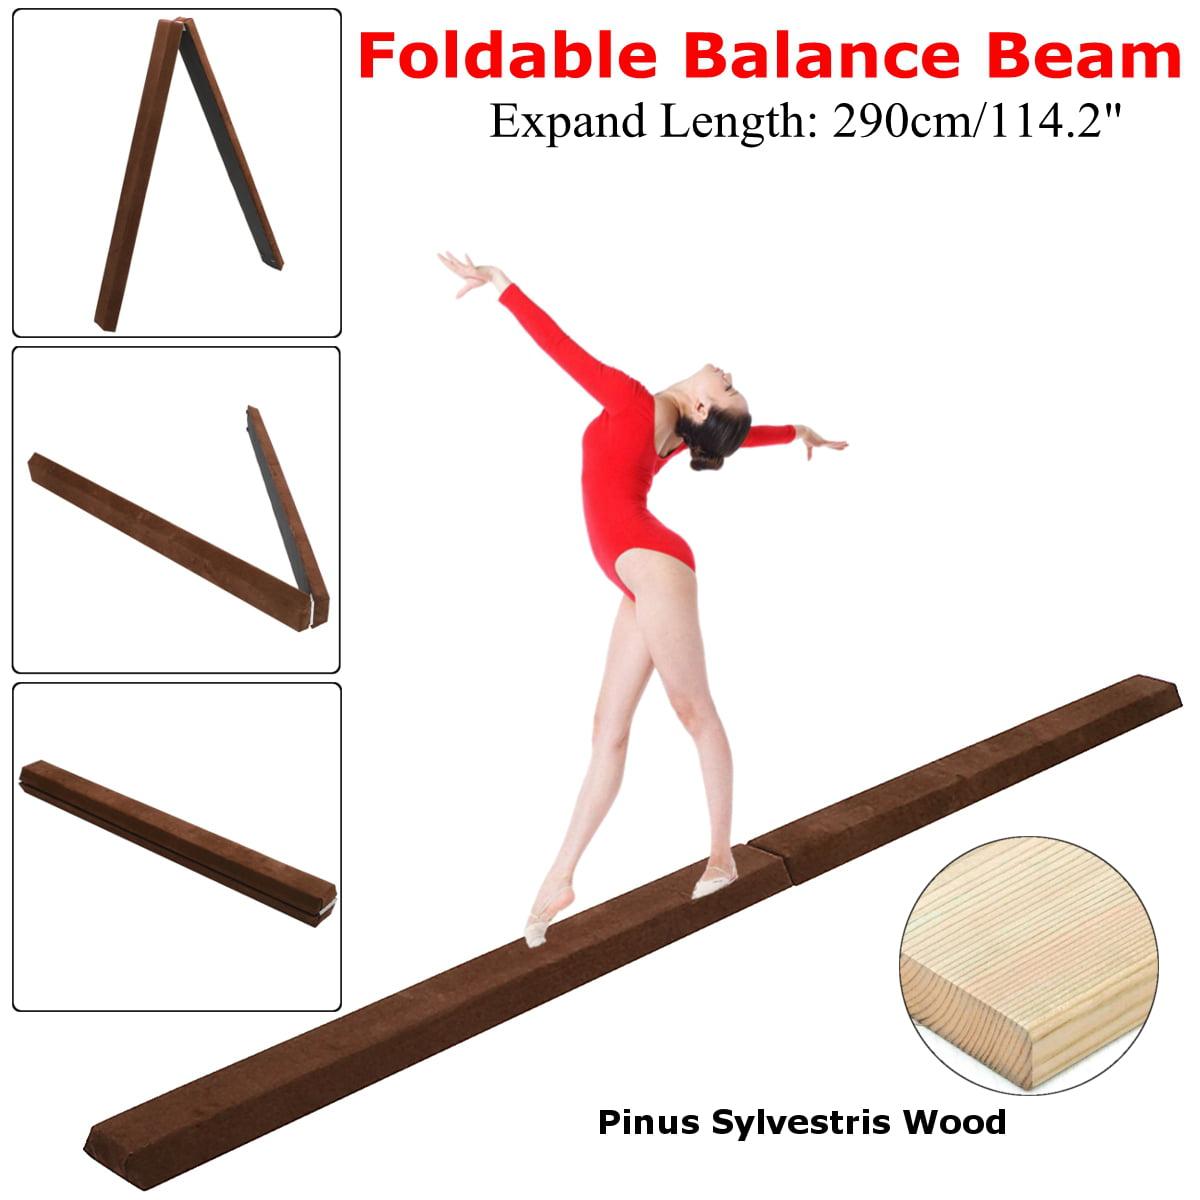 9.5' Foldable Gymnastics Balance Beam, Sectional Floor Gymnastics Bar with Anti-Slip Base, for Junior Kids Home Gym... by